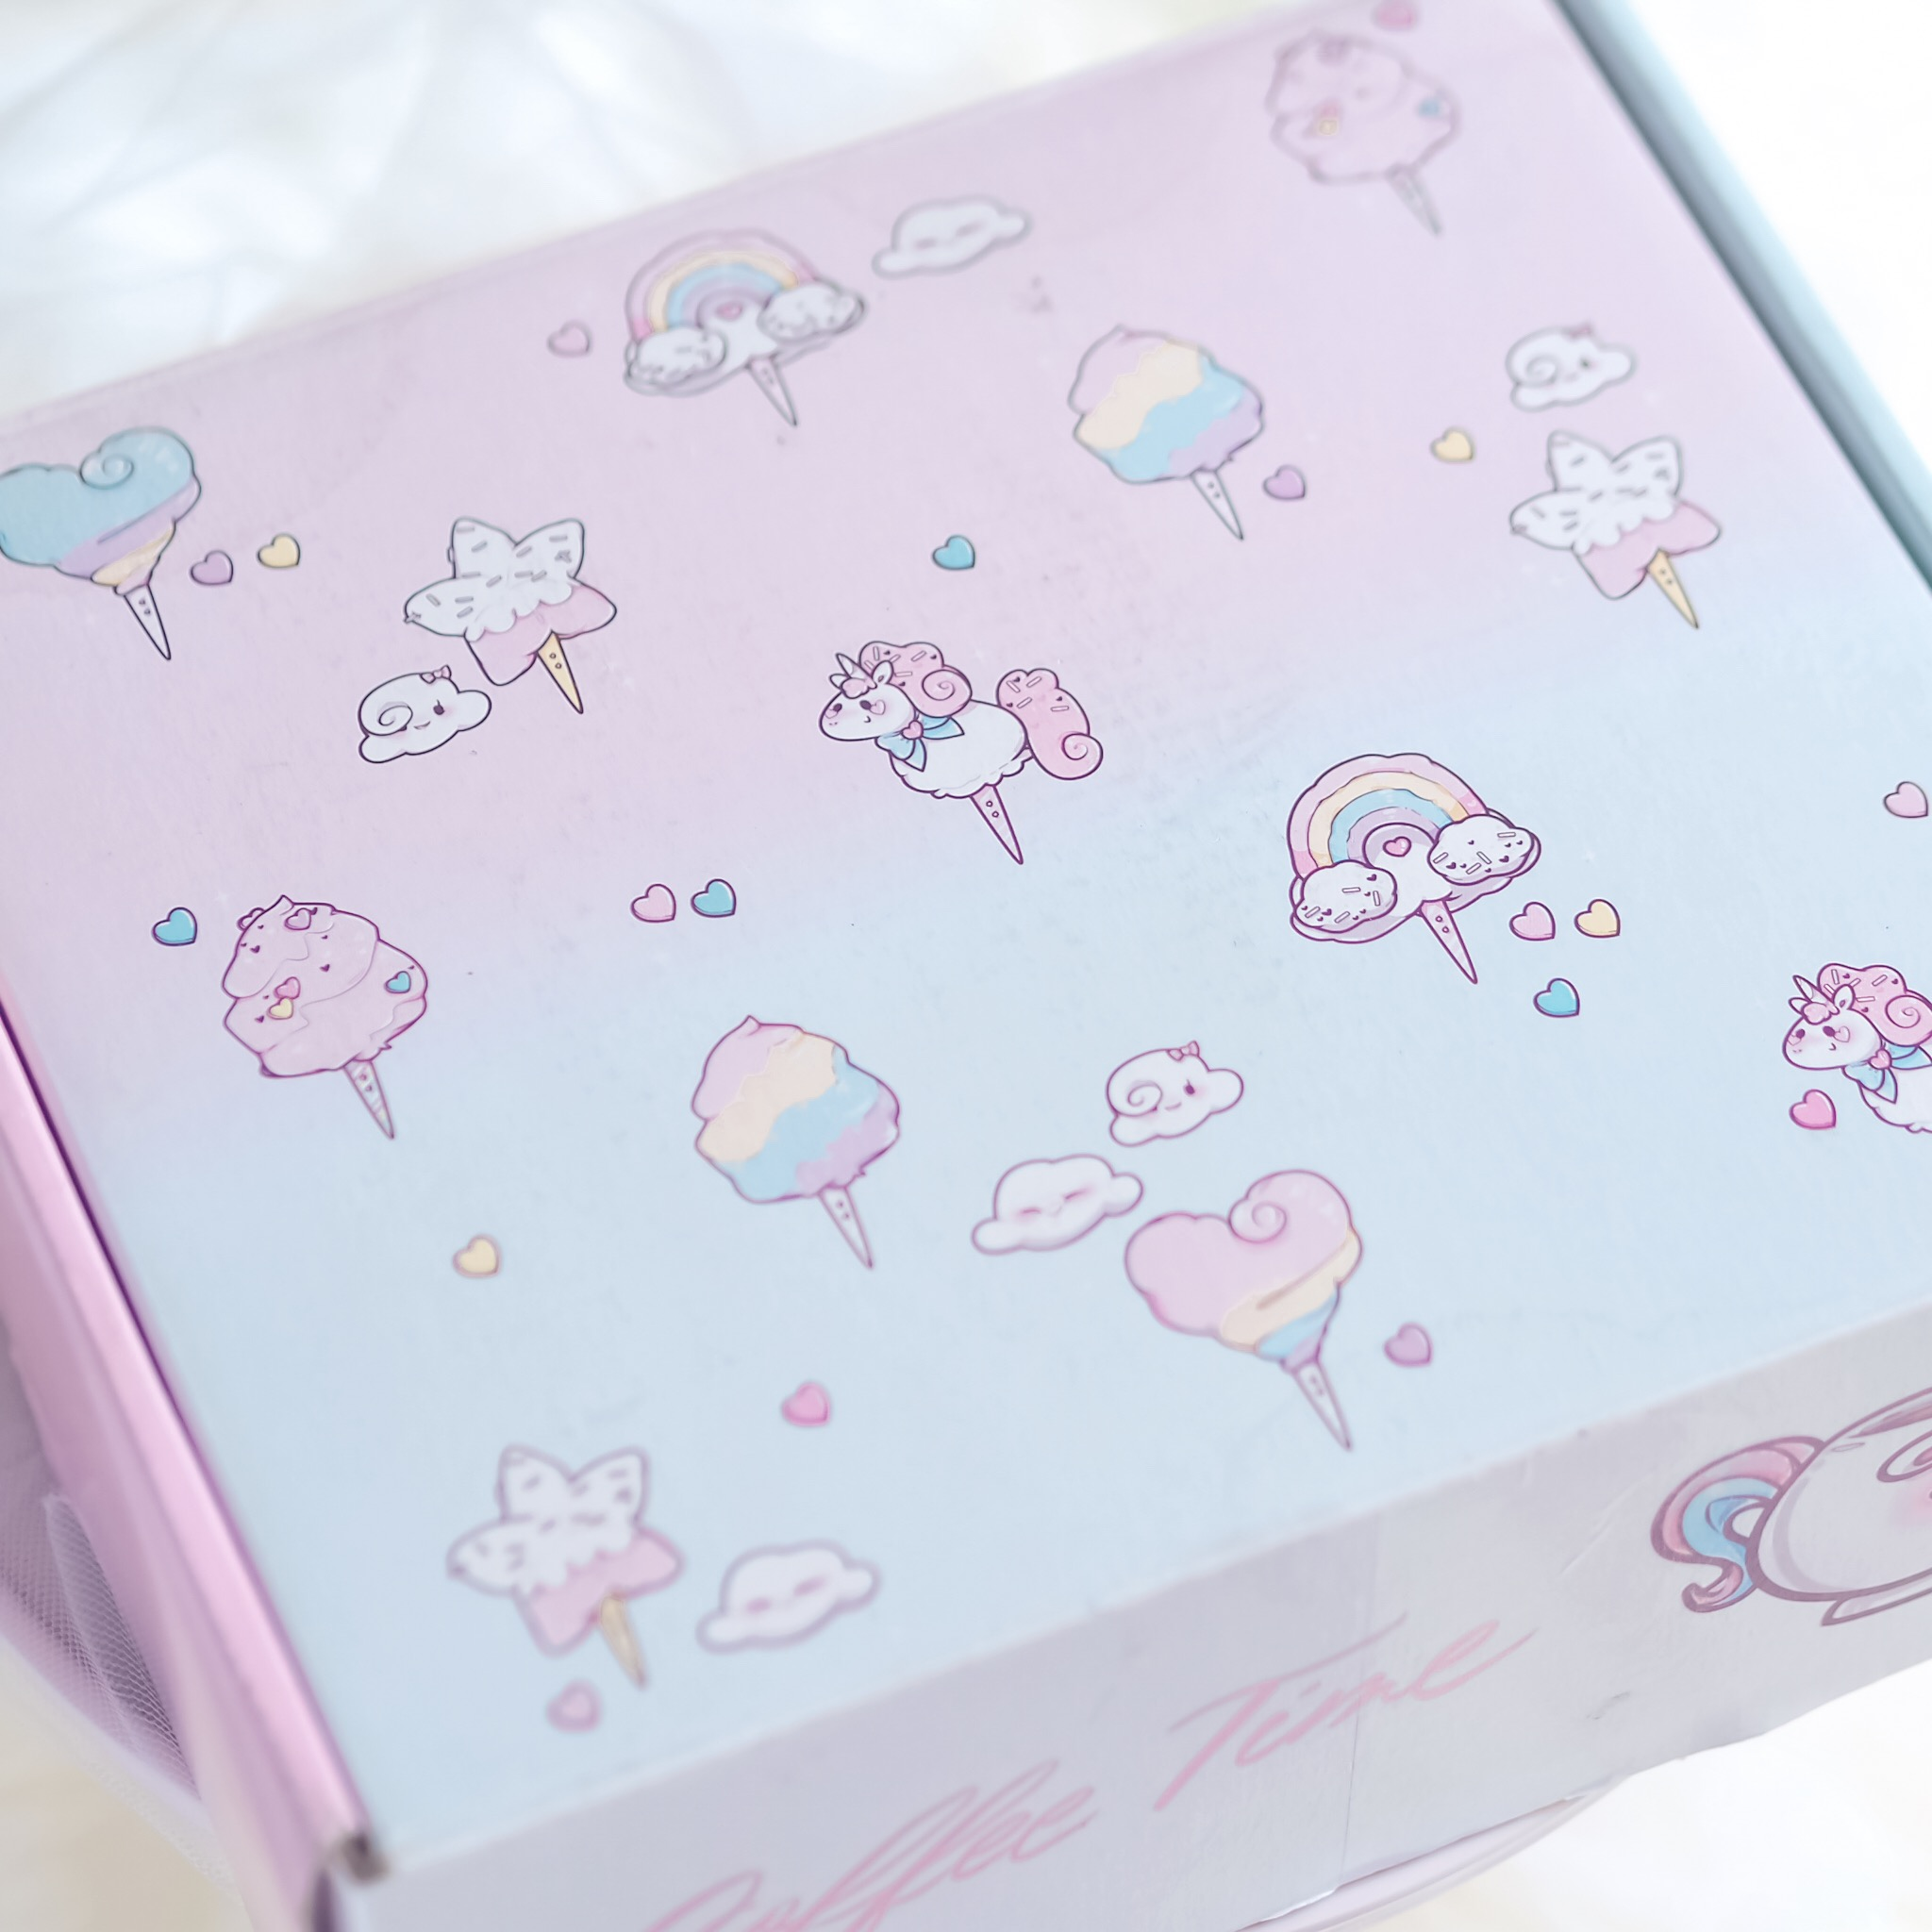 Cotton Candy Dreams SLMissGlam | Love Catherine